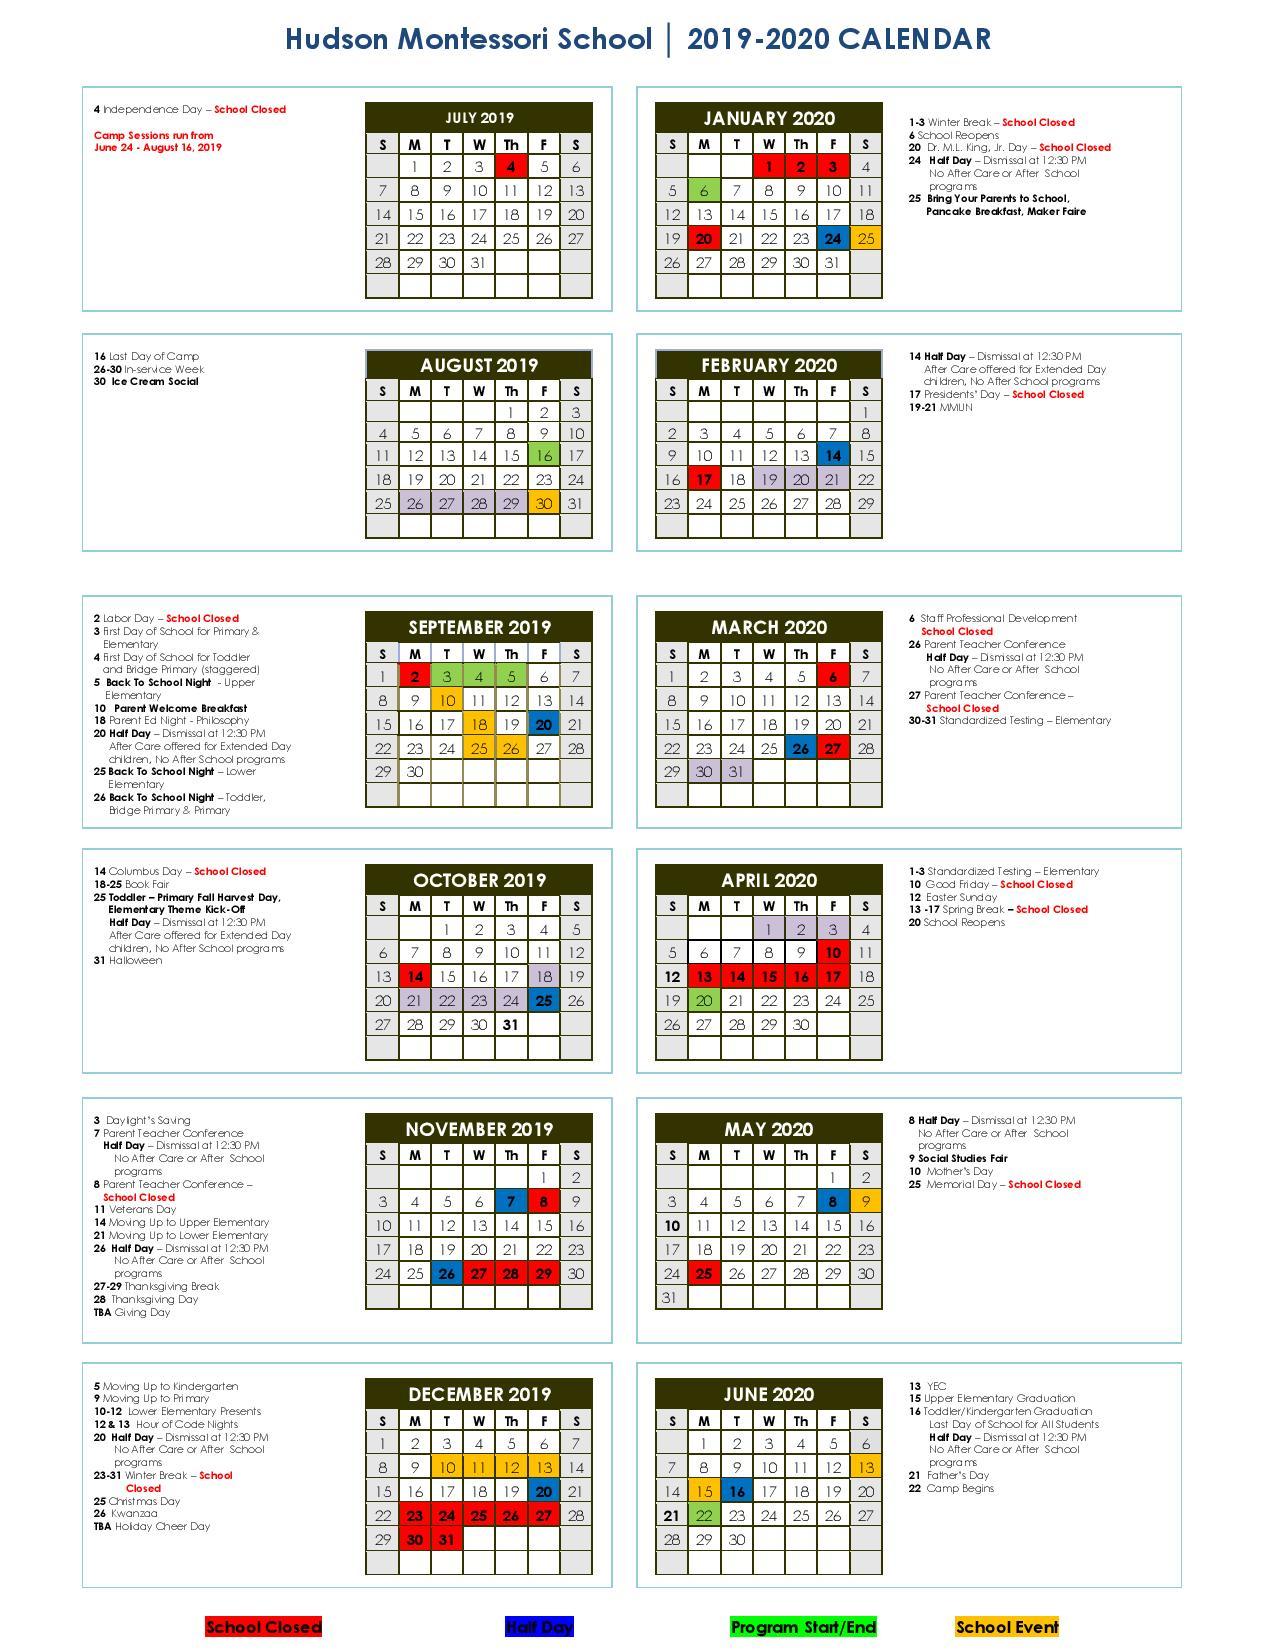 University Of Phoenix Holiday Calendar 2020 | Printable Throughout University Of Phoenix 2021 Calendar